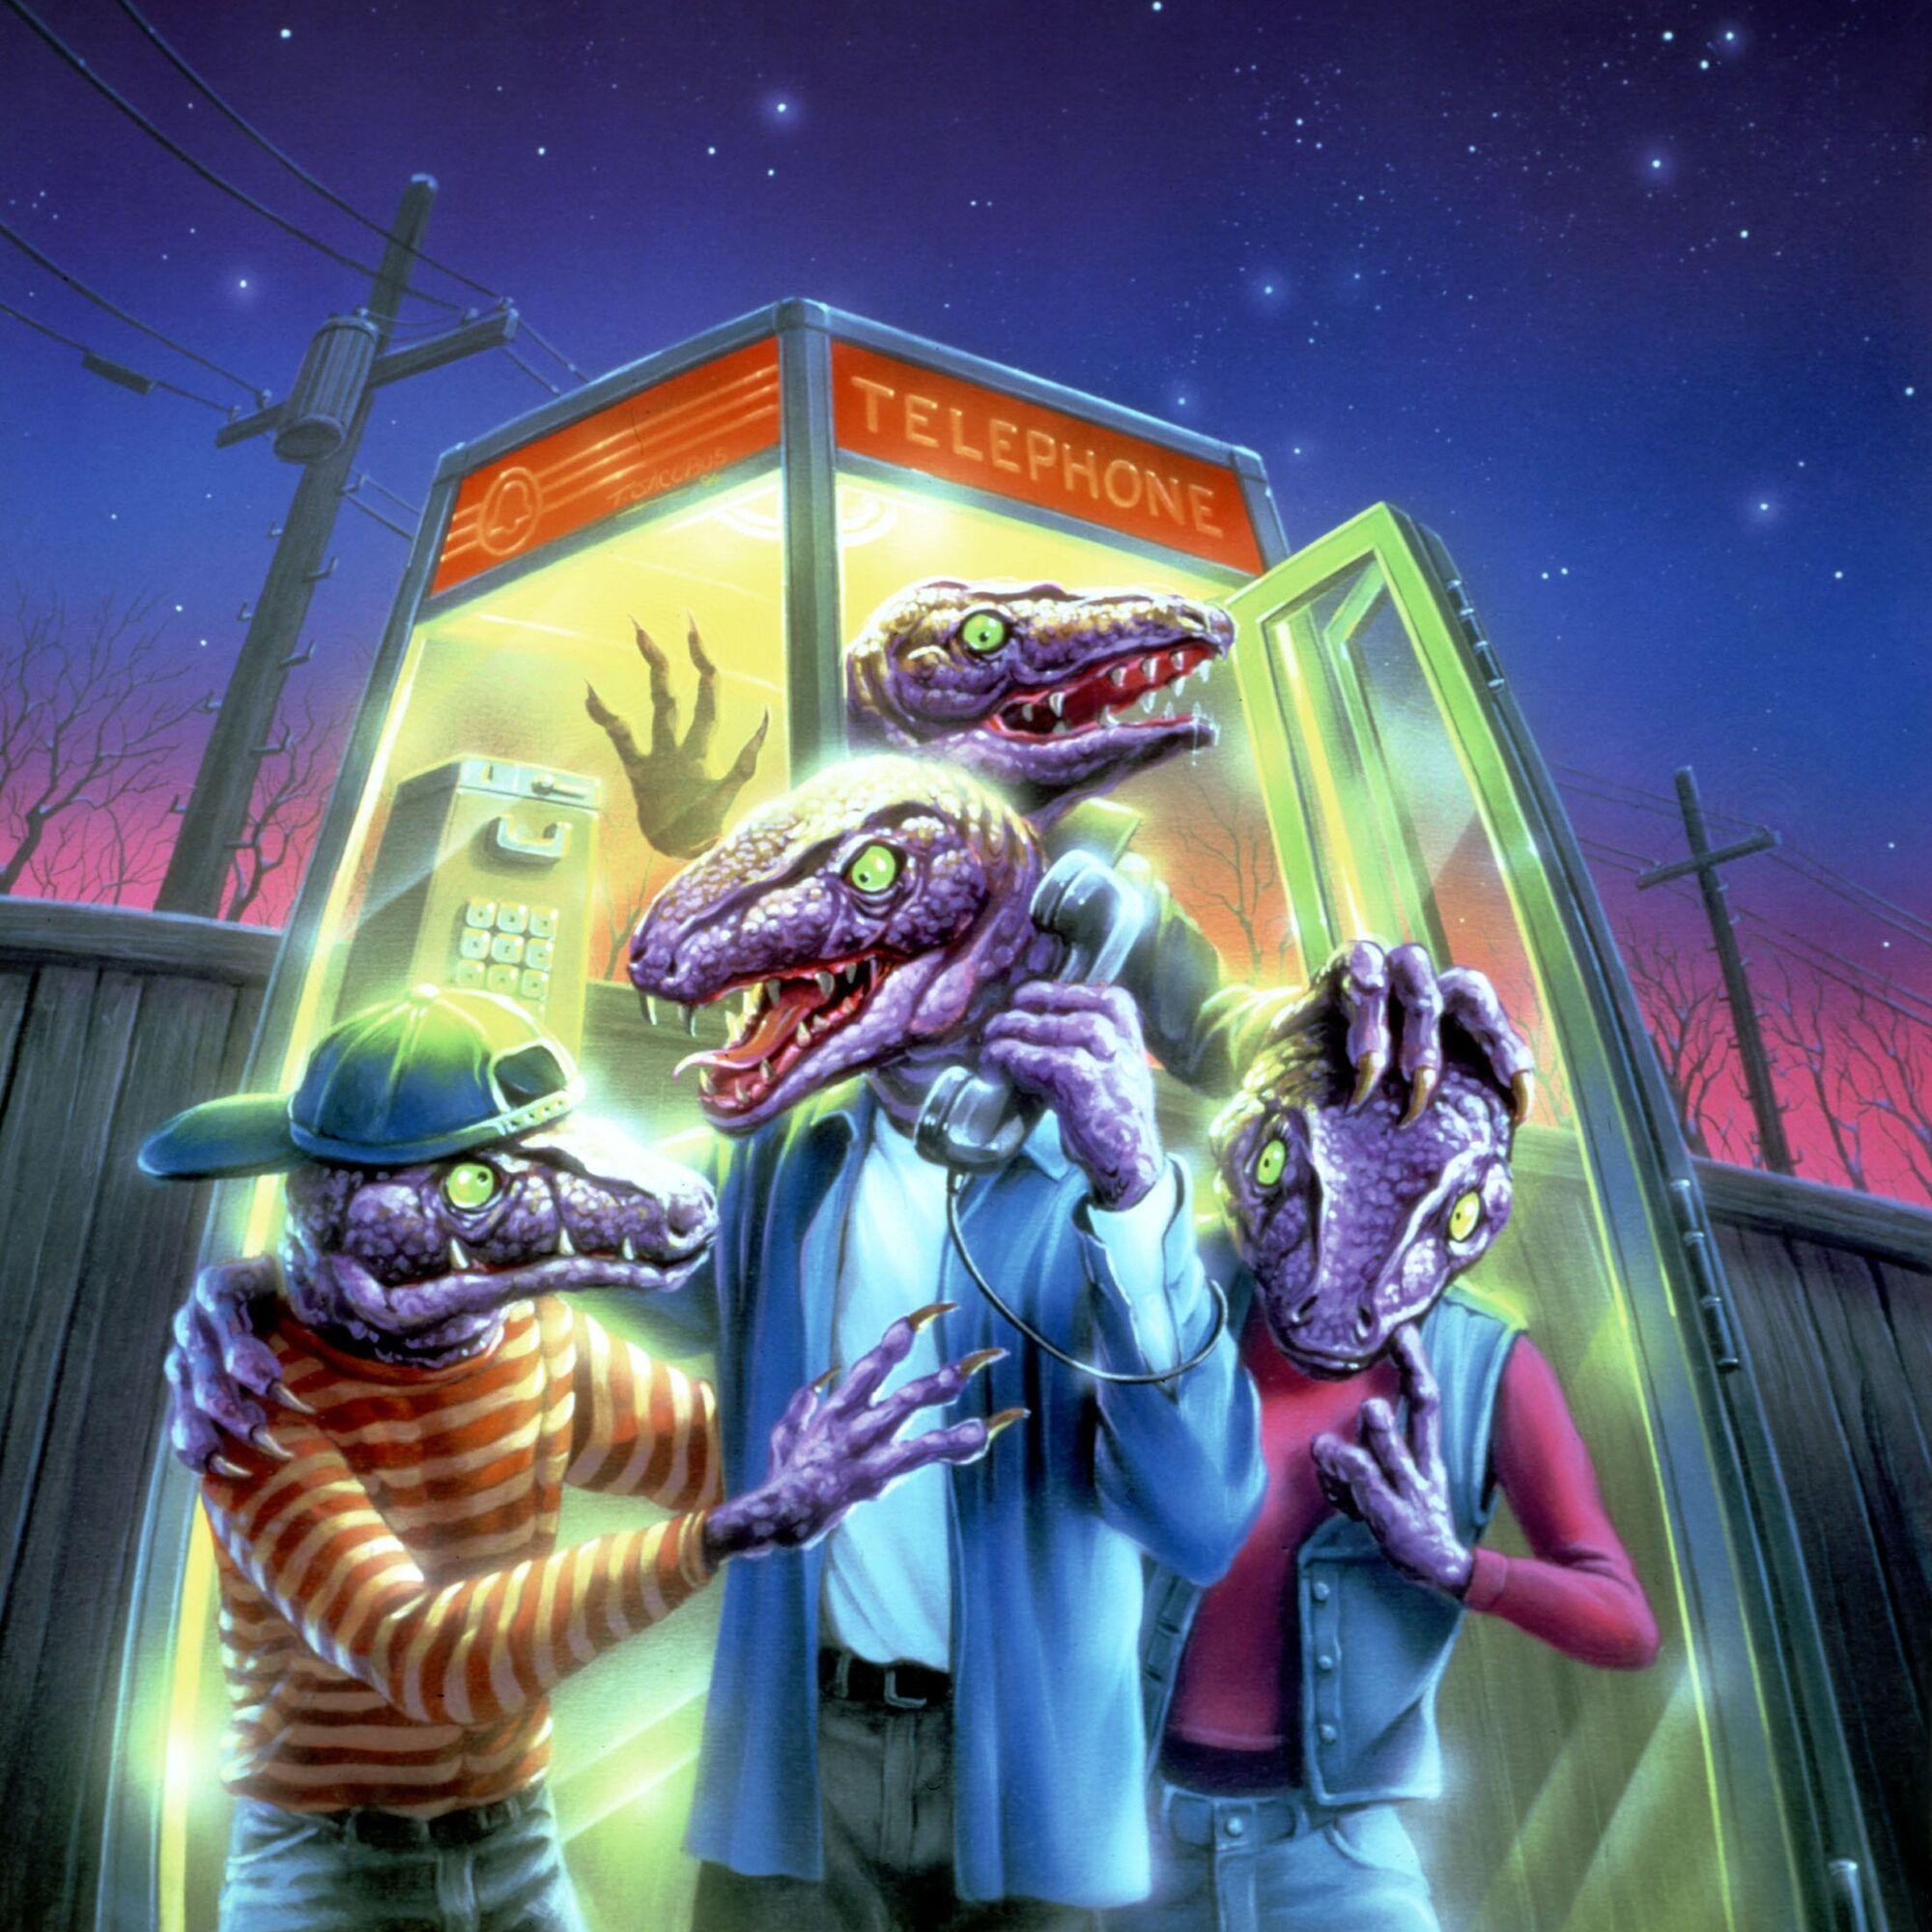 Creeps (Goosebumps) | Villains Wiki | FANDOM powered by Wikia